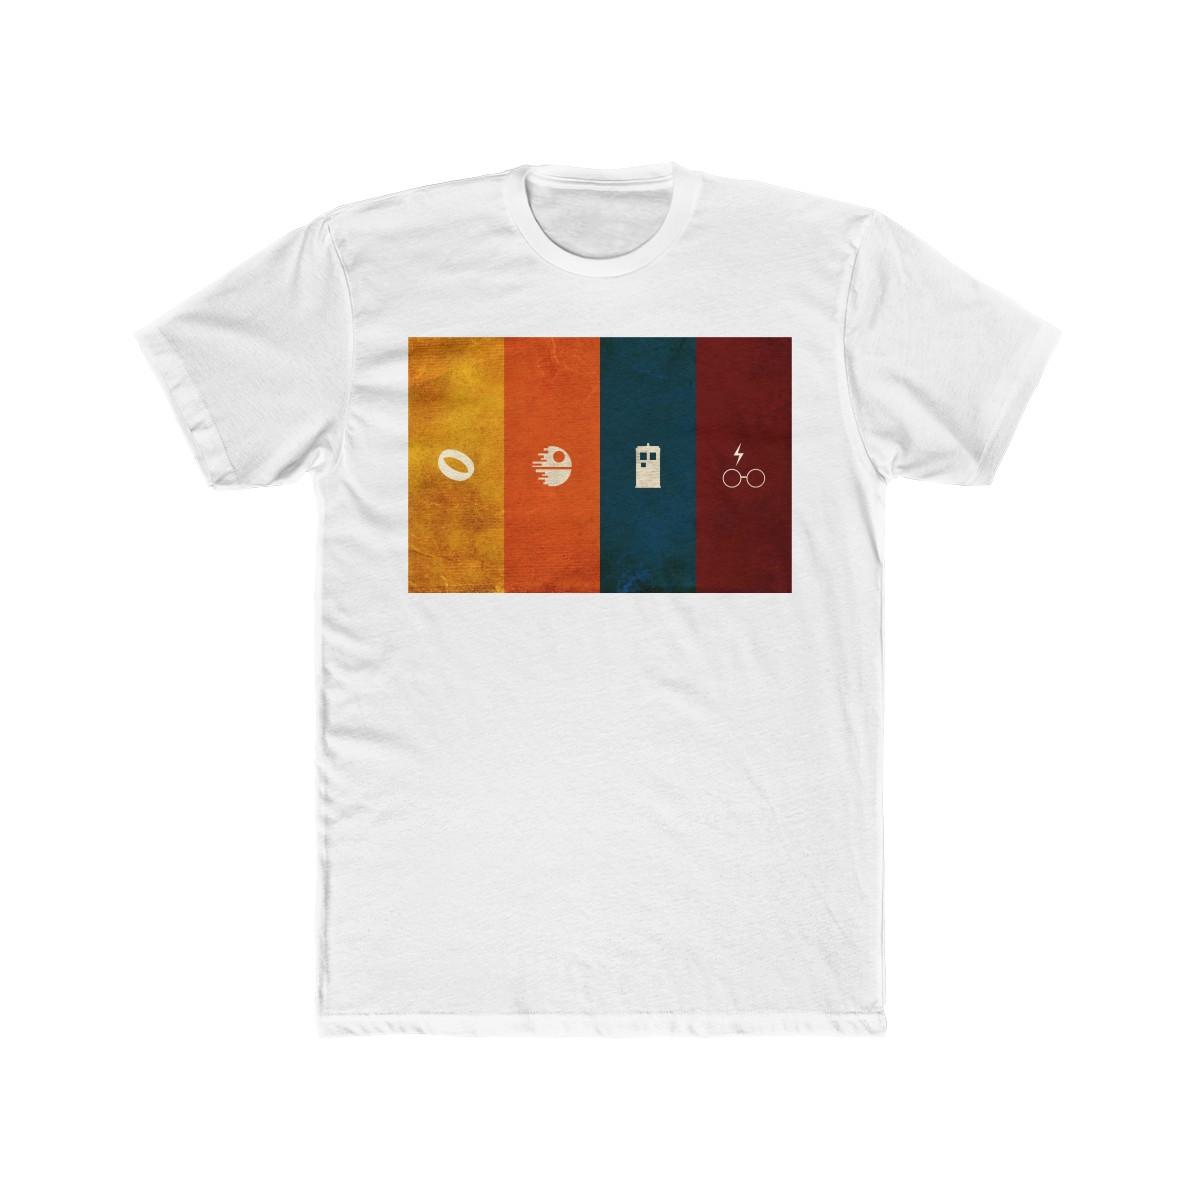 687574376c4e Geeky T-Shirt – Fantasy & Sci-Fi – Nerdy Minimalist Geek Designed Cotton  Crew Tee